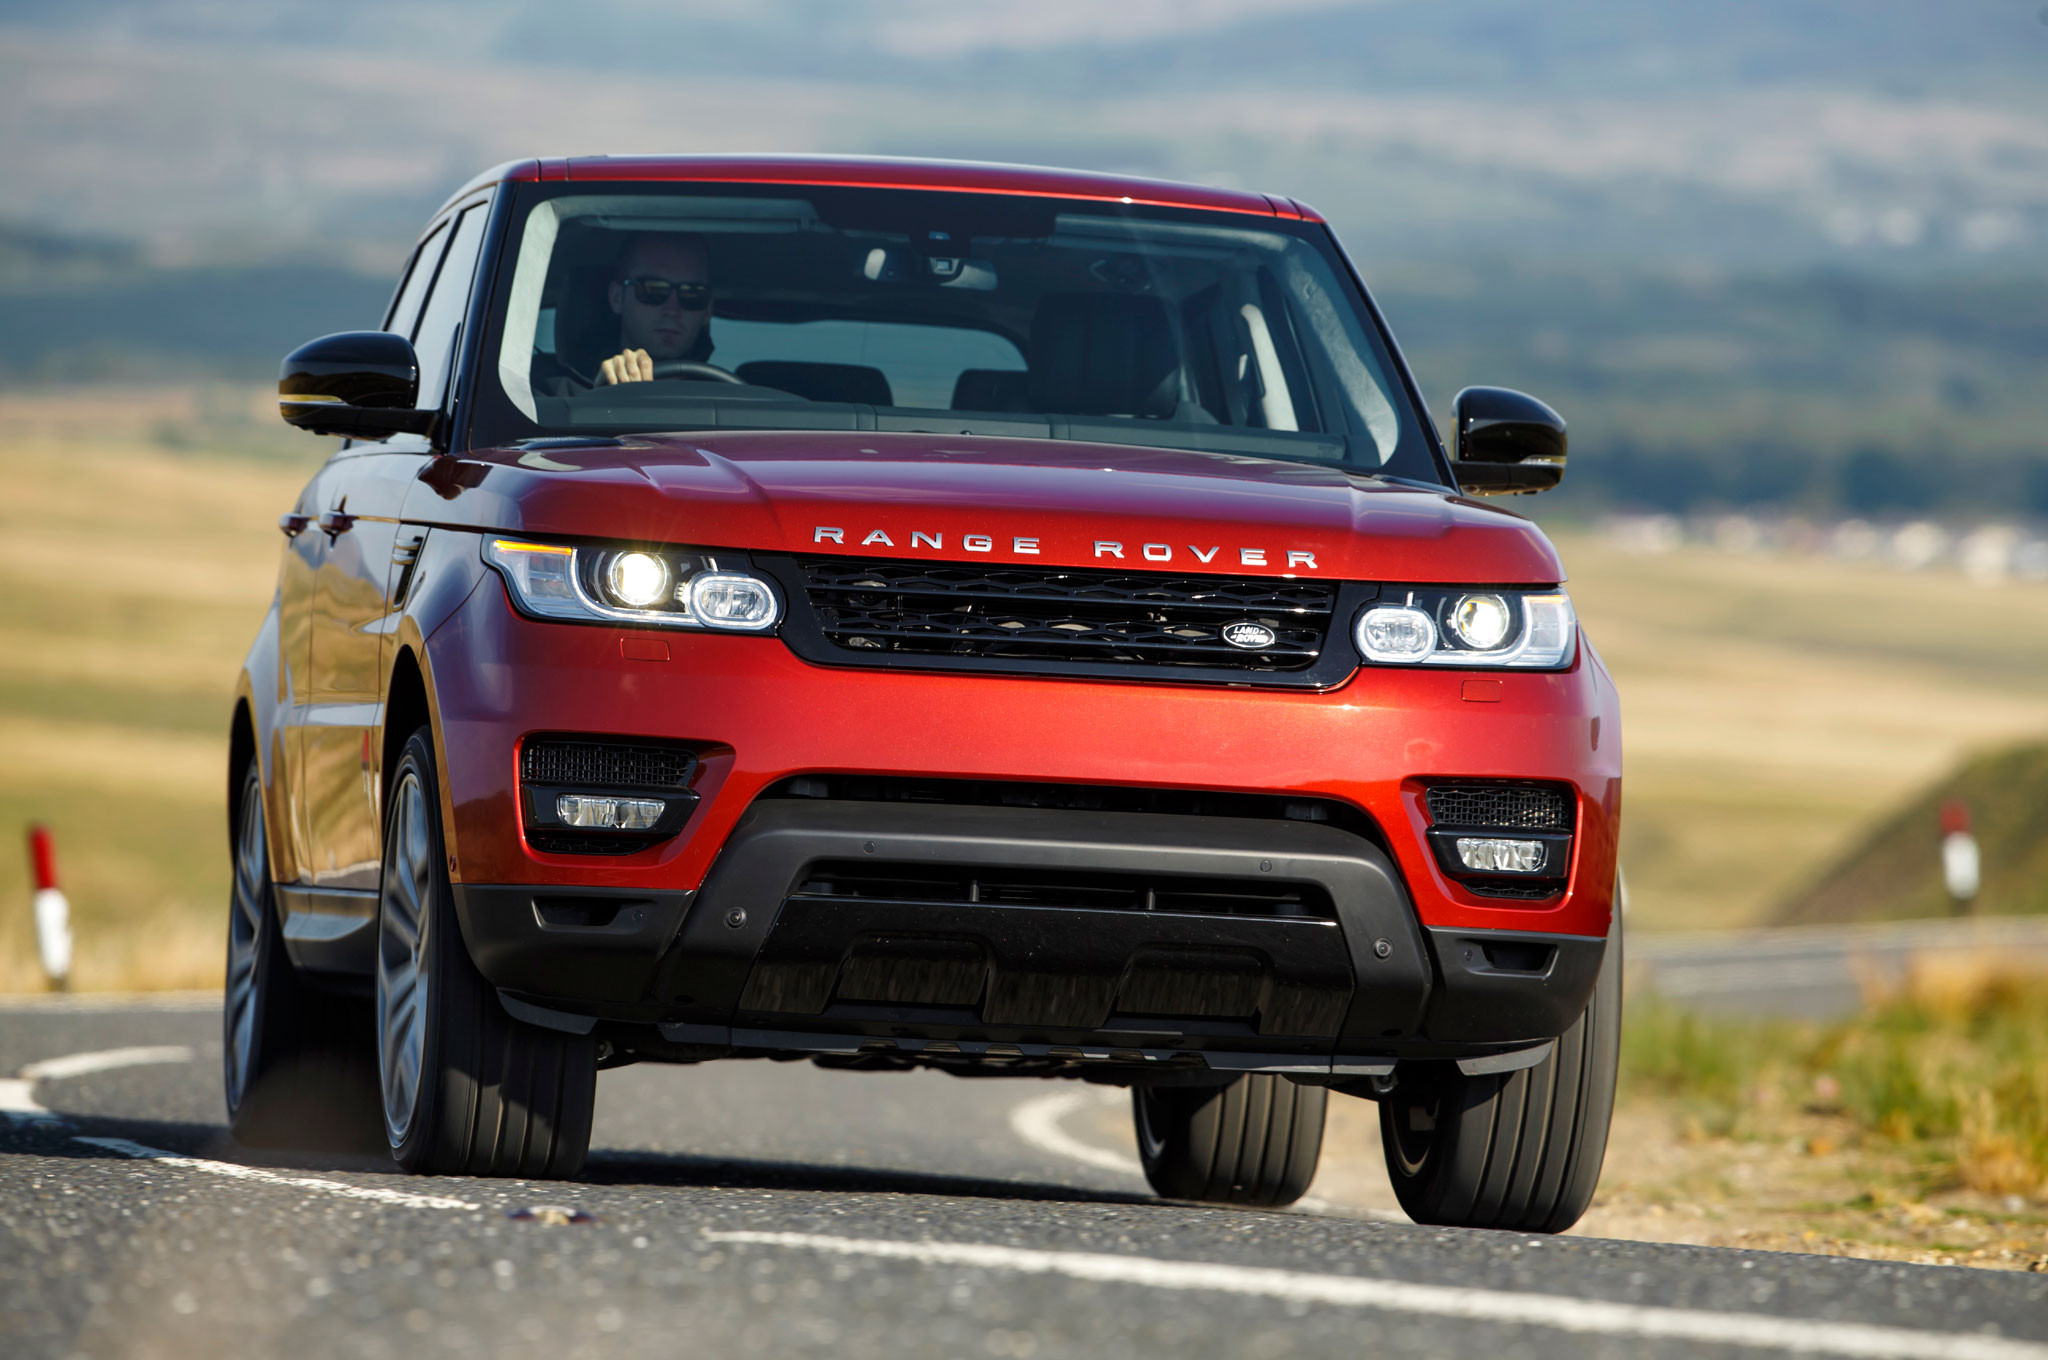 hd sport range rover